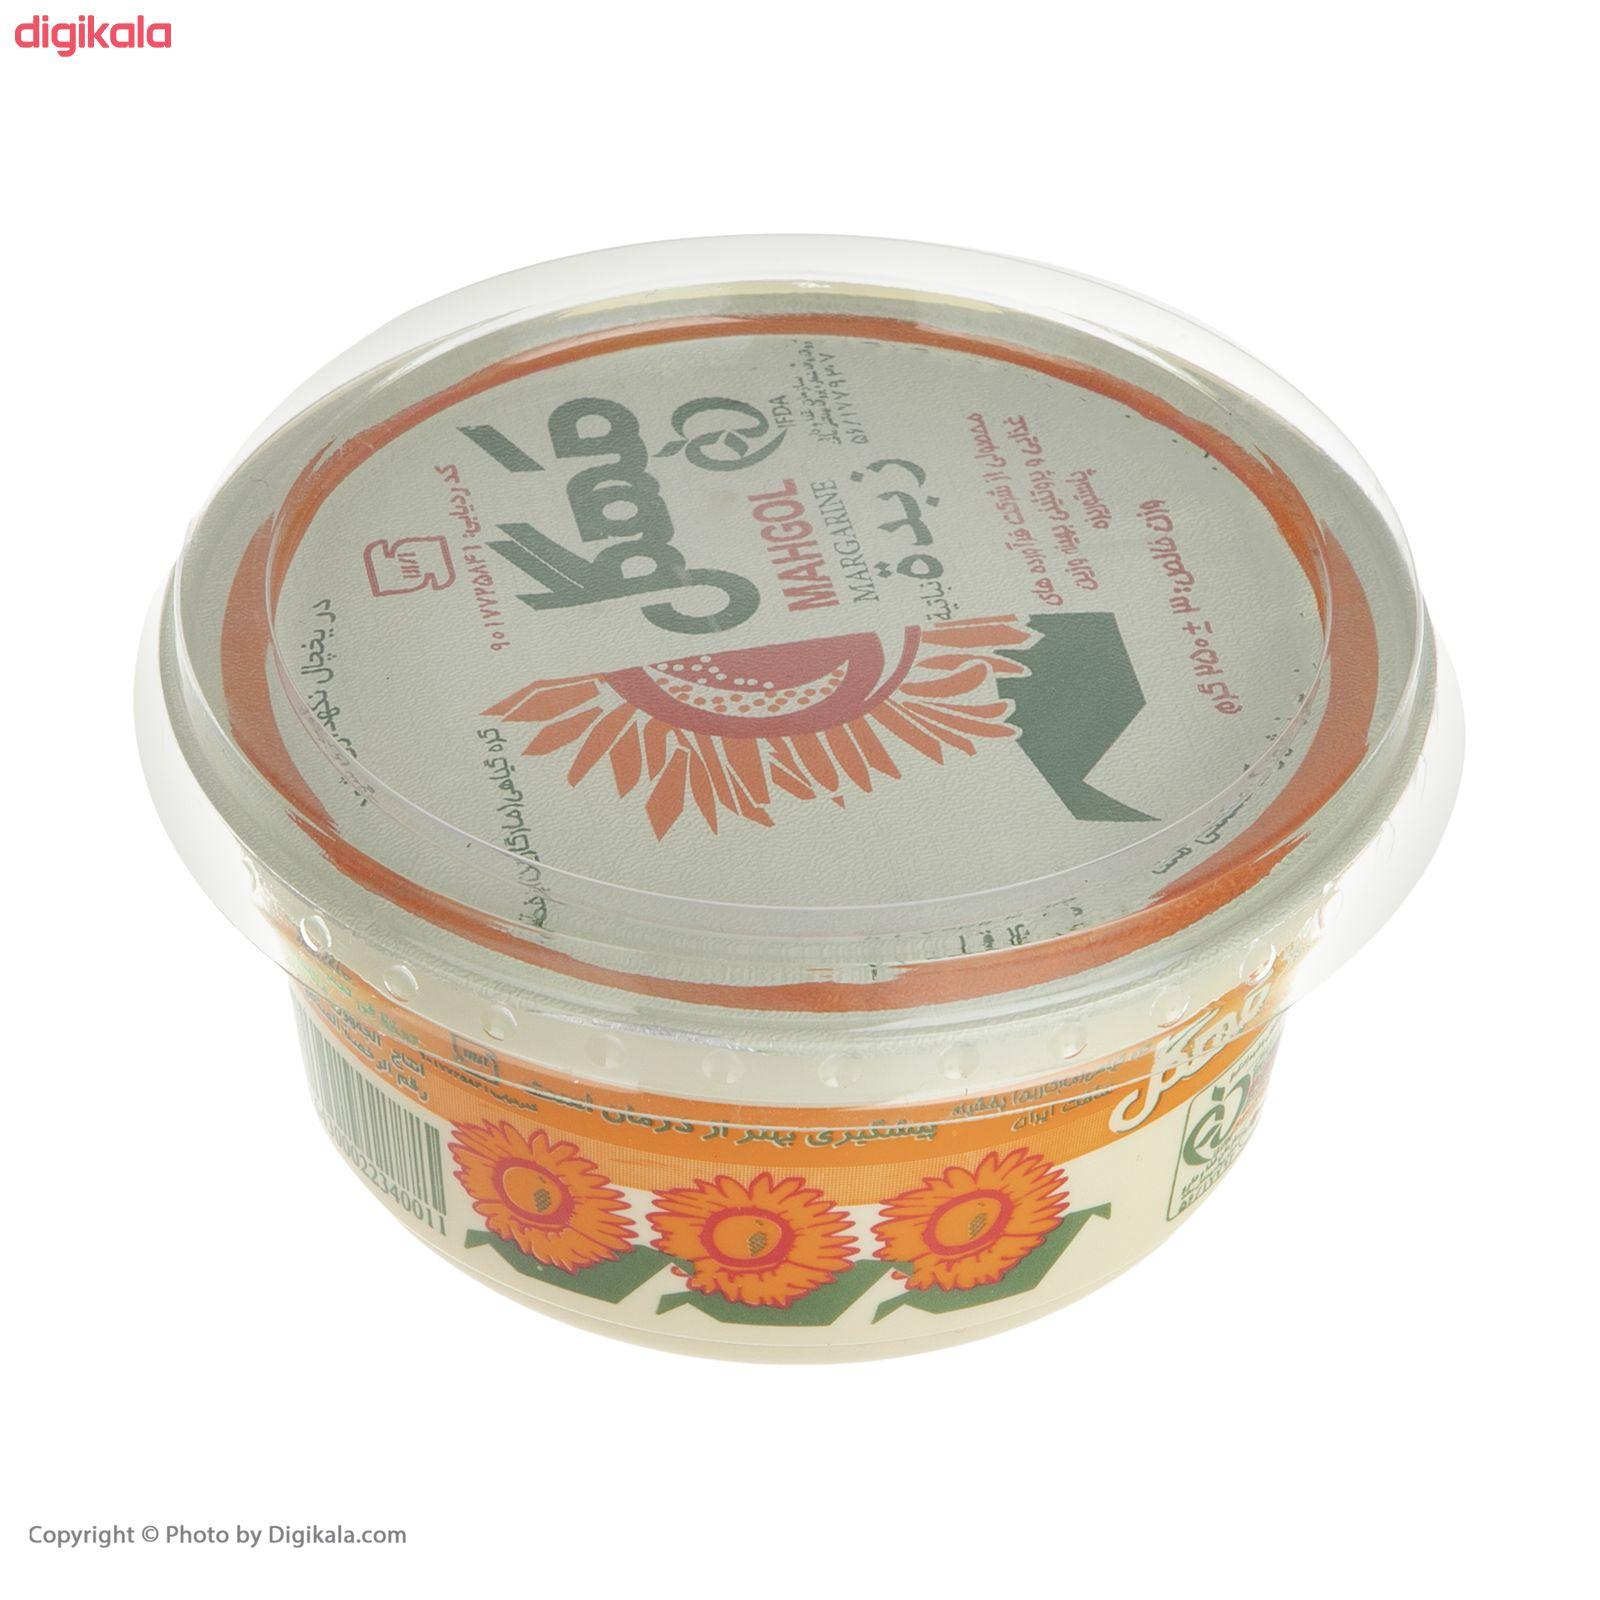 کره گیاهی مهگل - 250 گرم  main 1 1